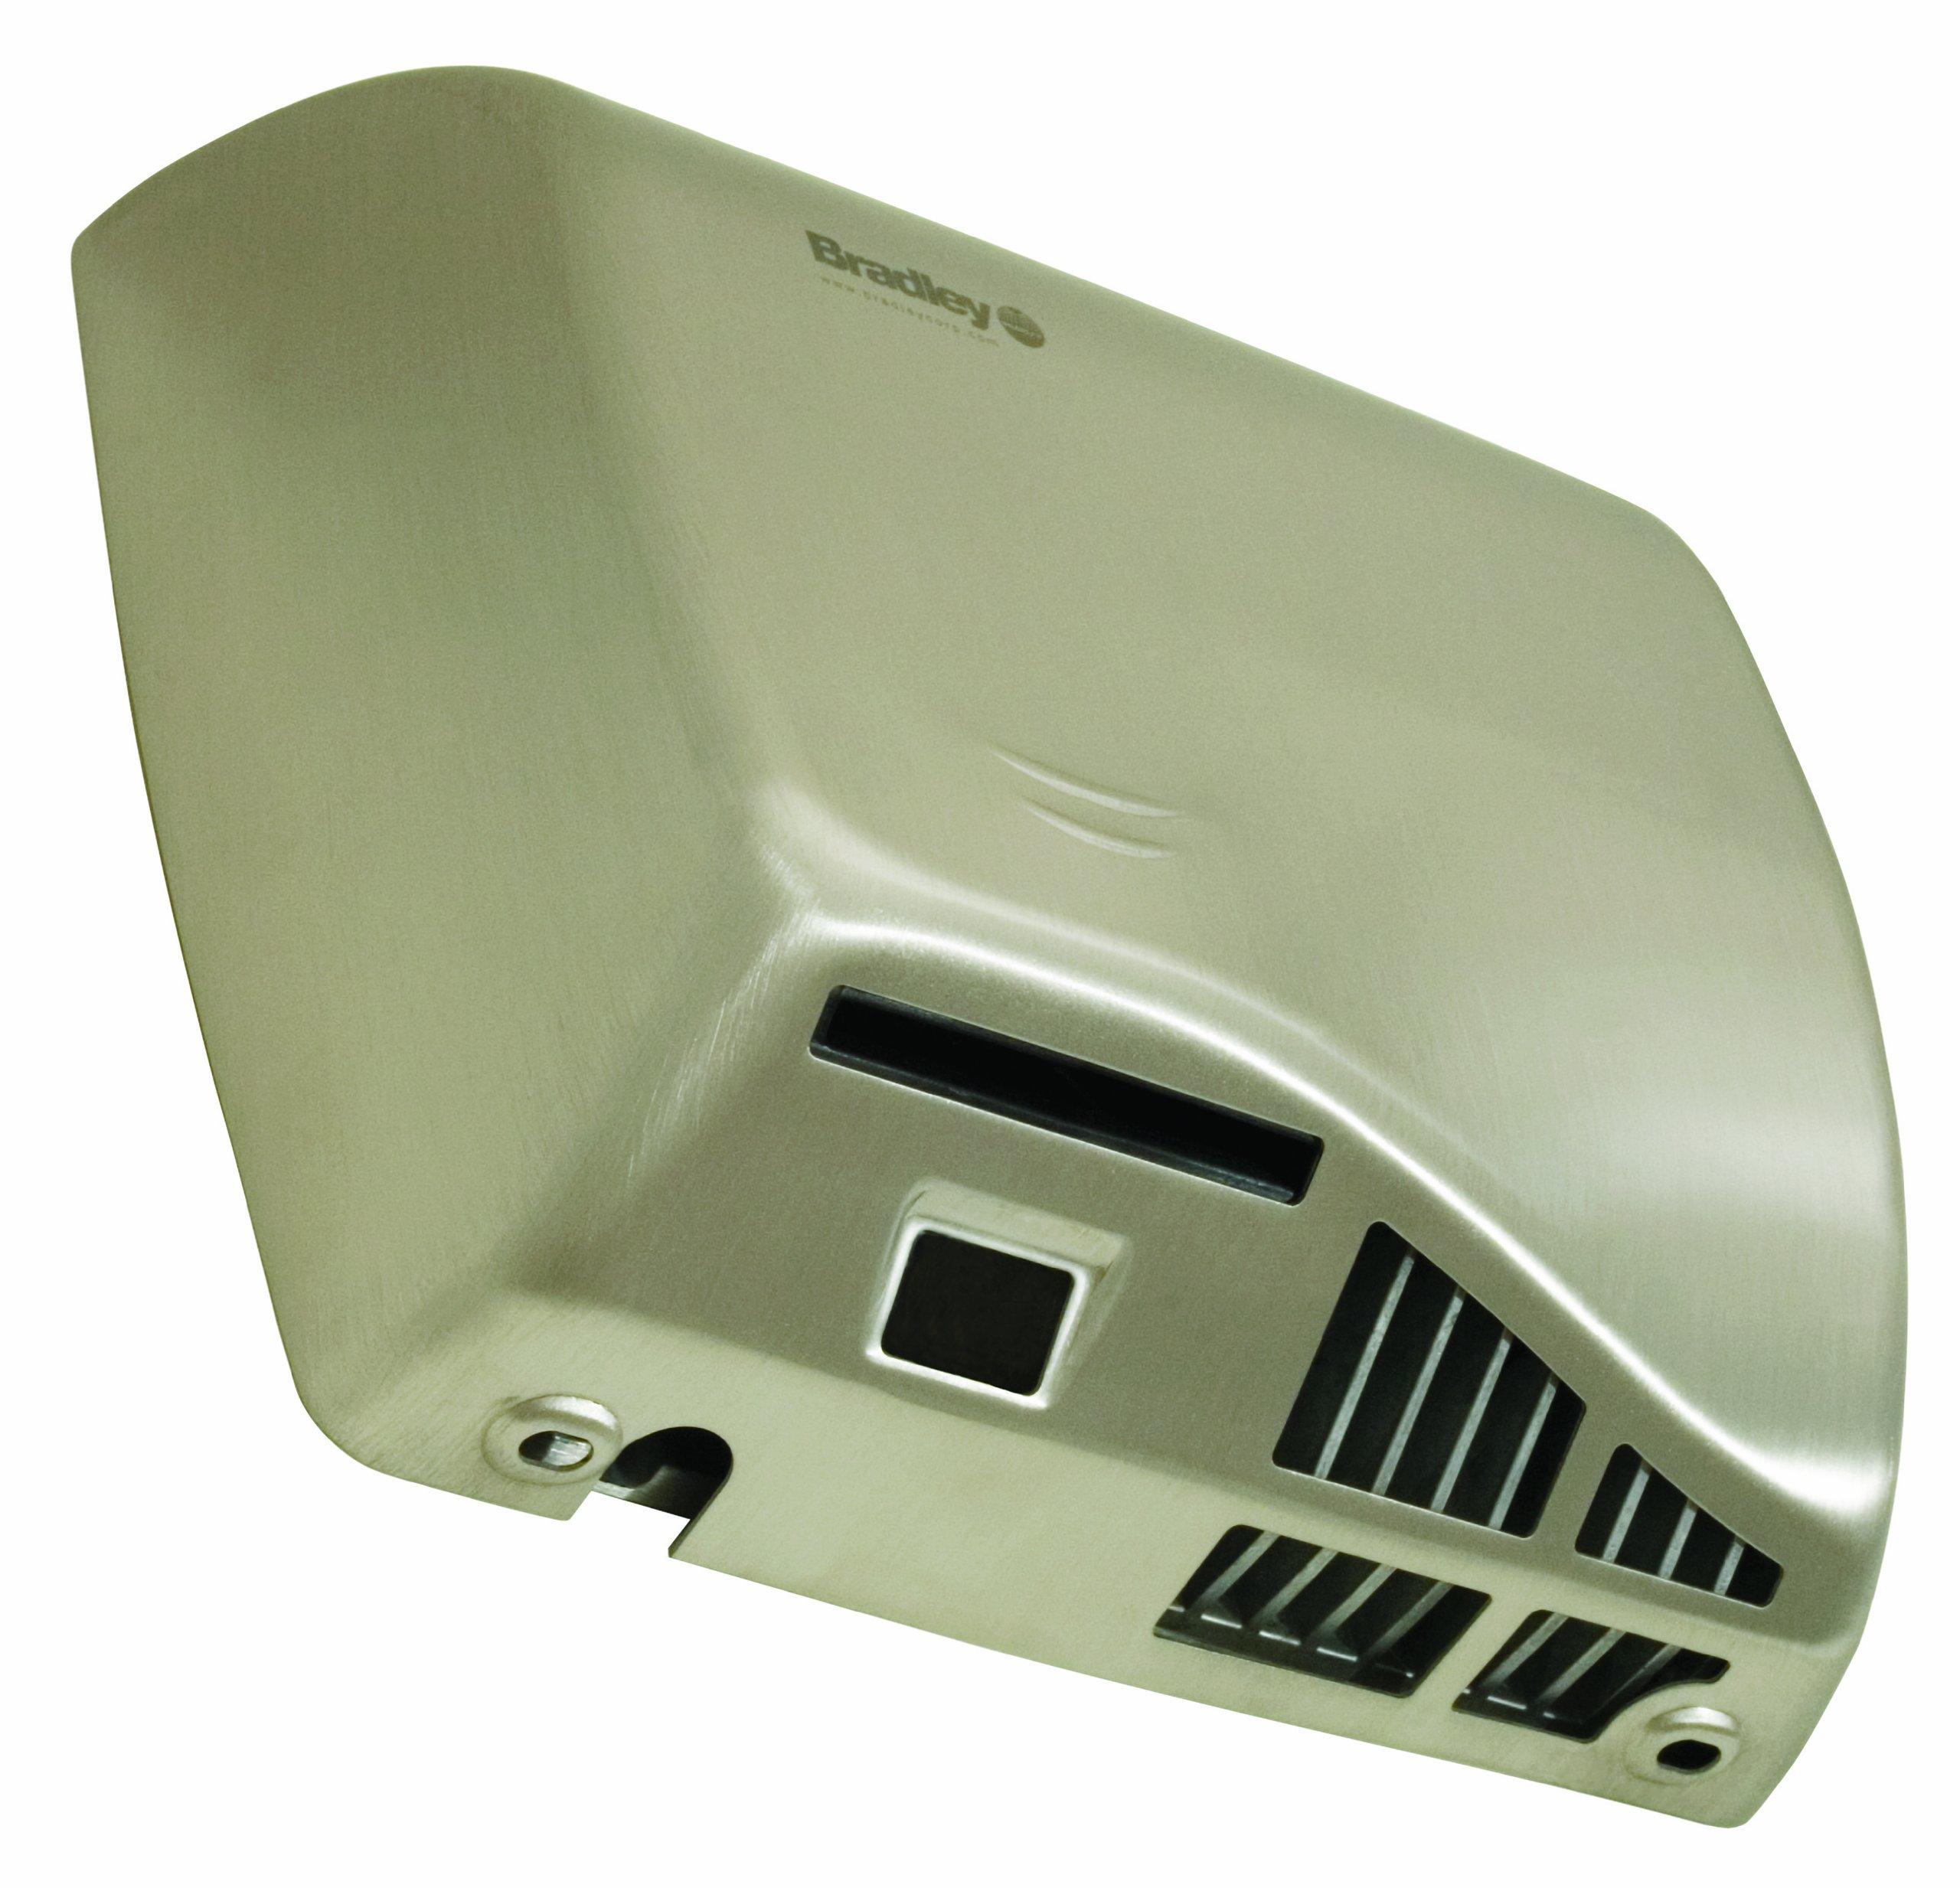 Bradley 2902-287400 Stainless Steel Adjustable Sensor Operated Warm Air Hand Dryer, 11-1/2'' Width x 10-1/2'' Height x 4'' Depth